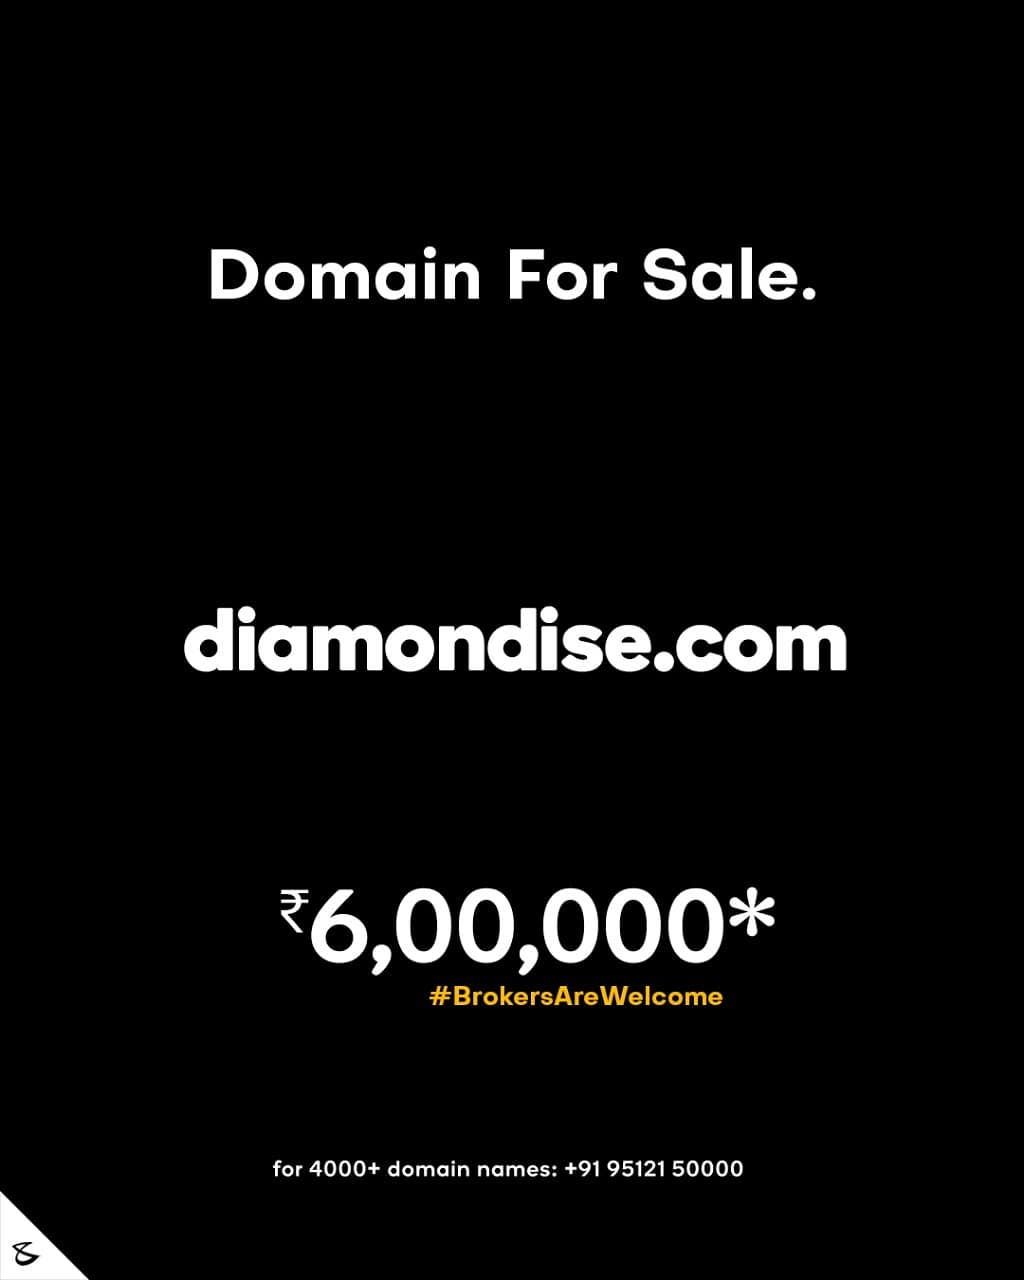 Your domain should shine bright like your business.  #domains #domainnames #domainsforsale #branding #website #godaddy #domainnameforsale #premiumdomains #bhfyp #CompuBrain